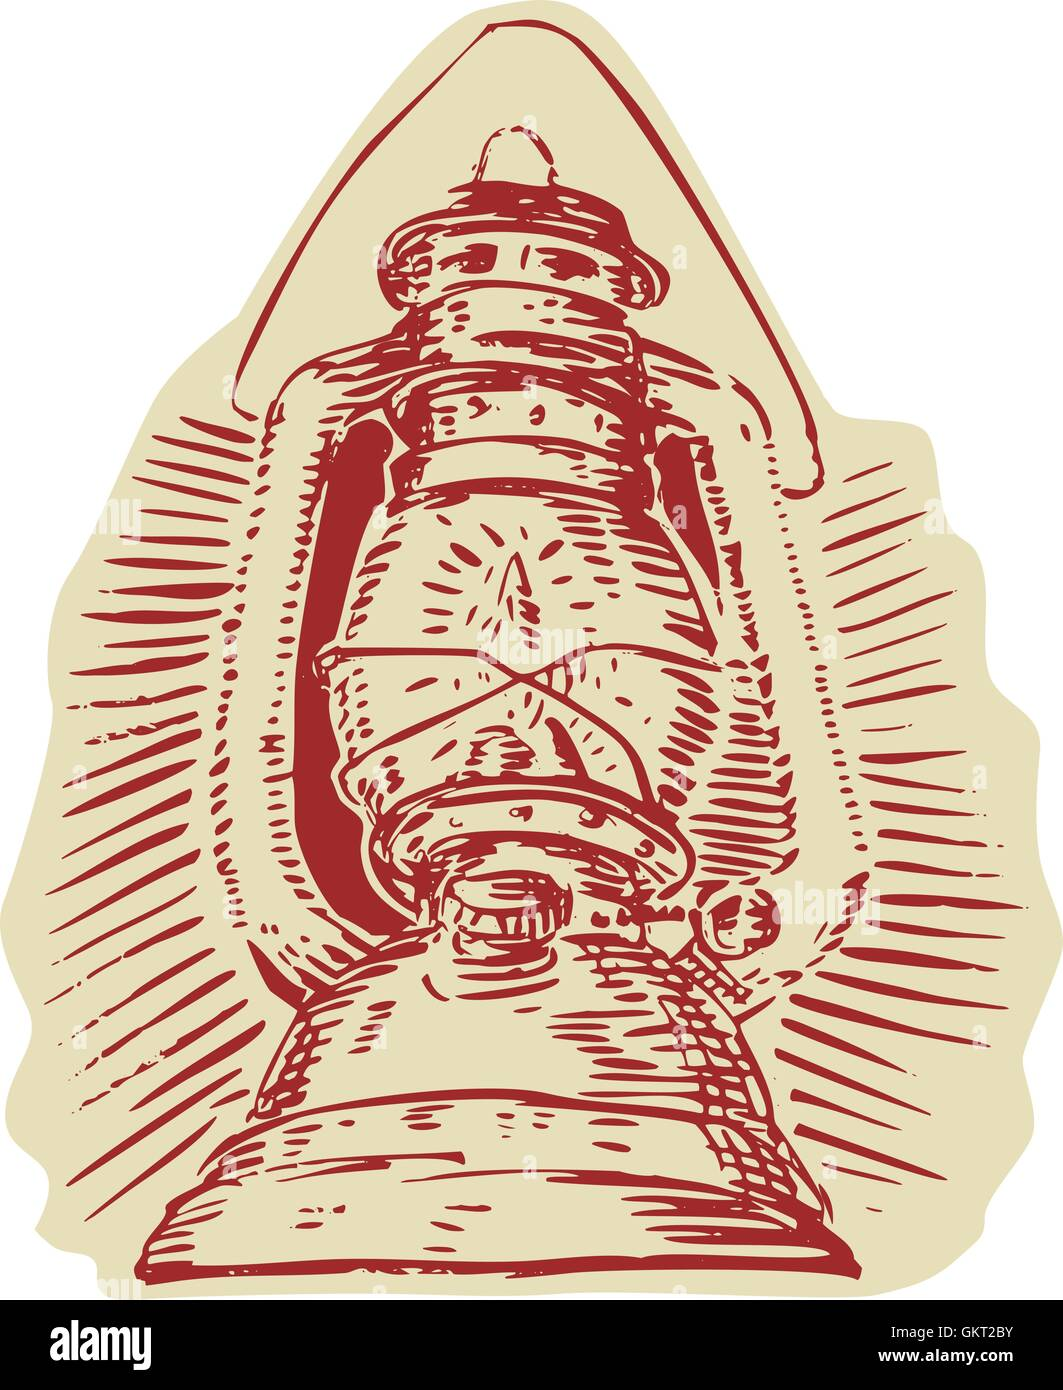 Kerosene Lamp Etching - Stock Vector